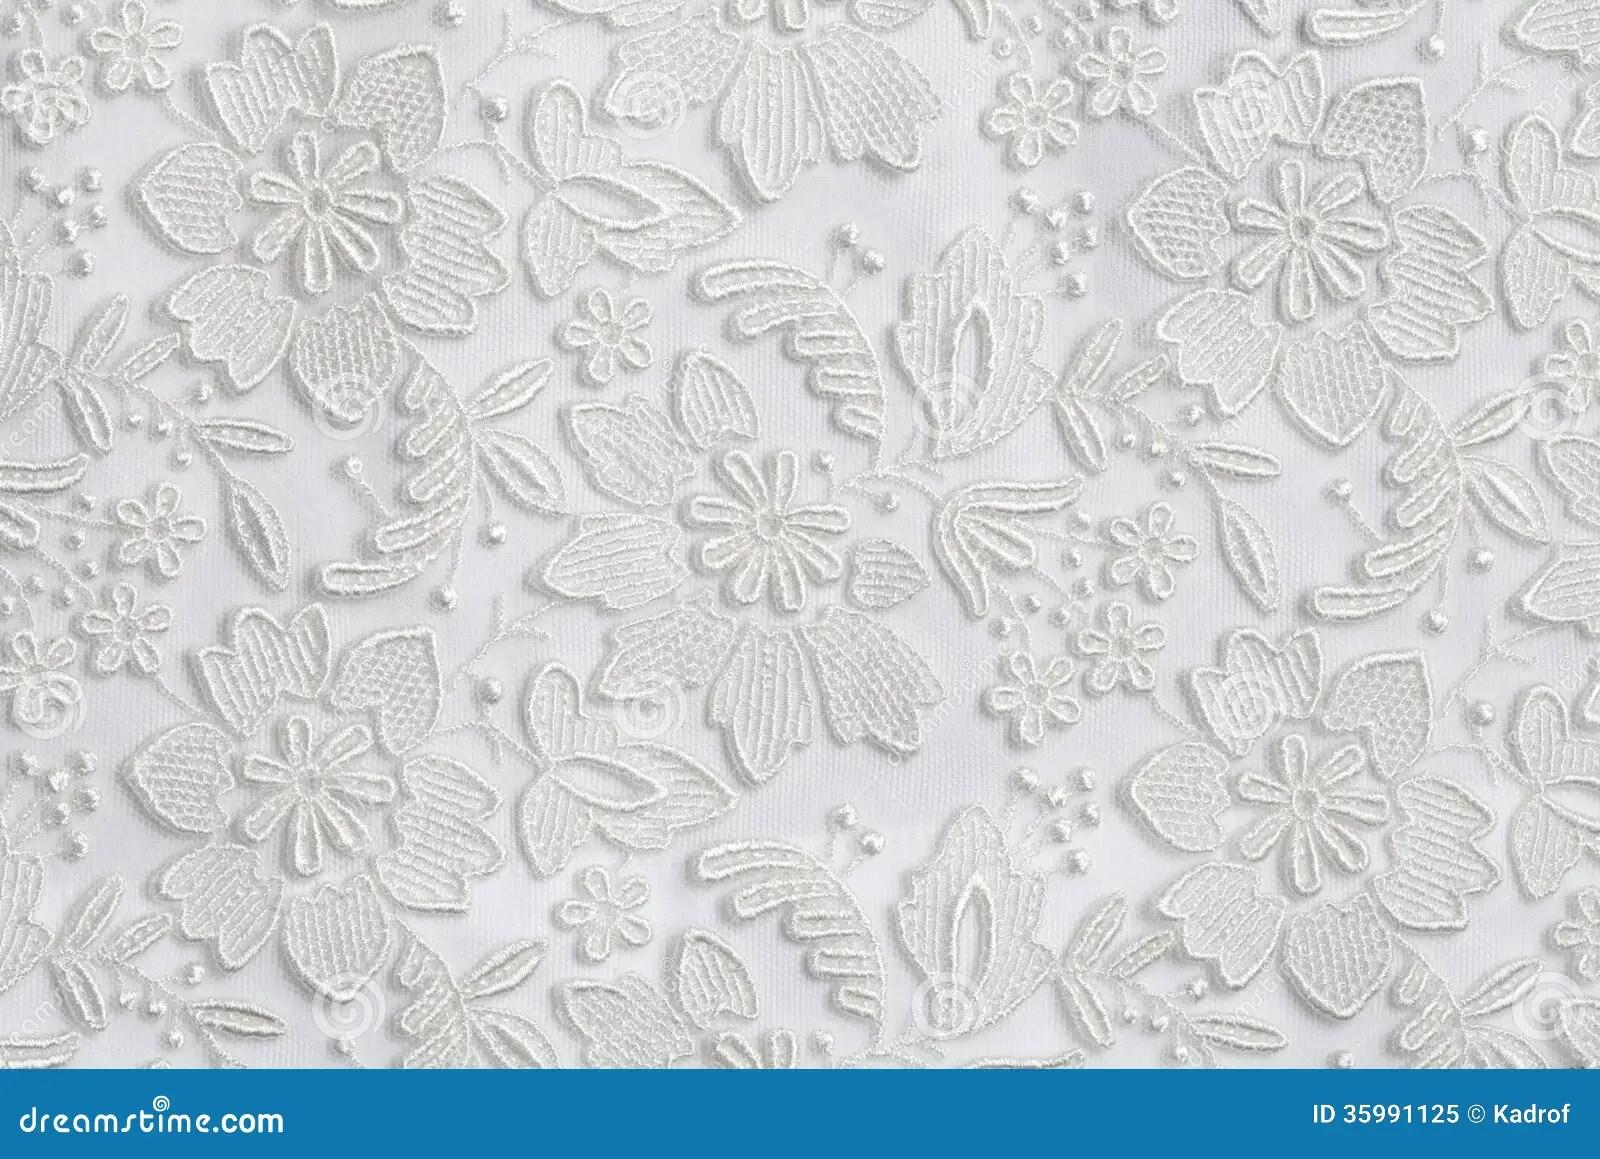 Fundo Floral Branco Da Textura Do Laco Imagem De Stock